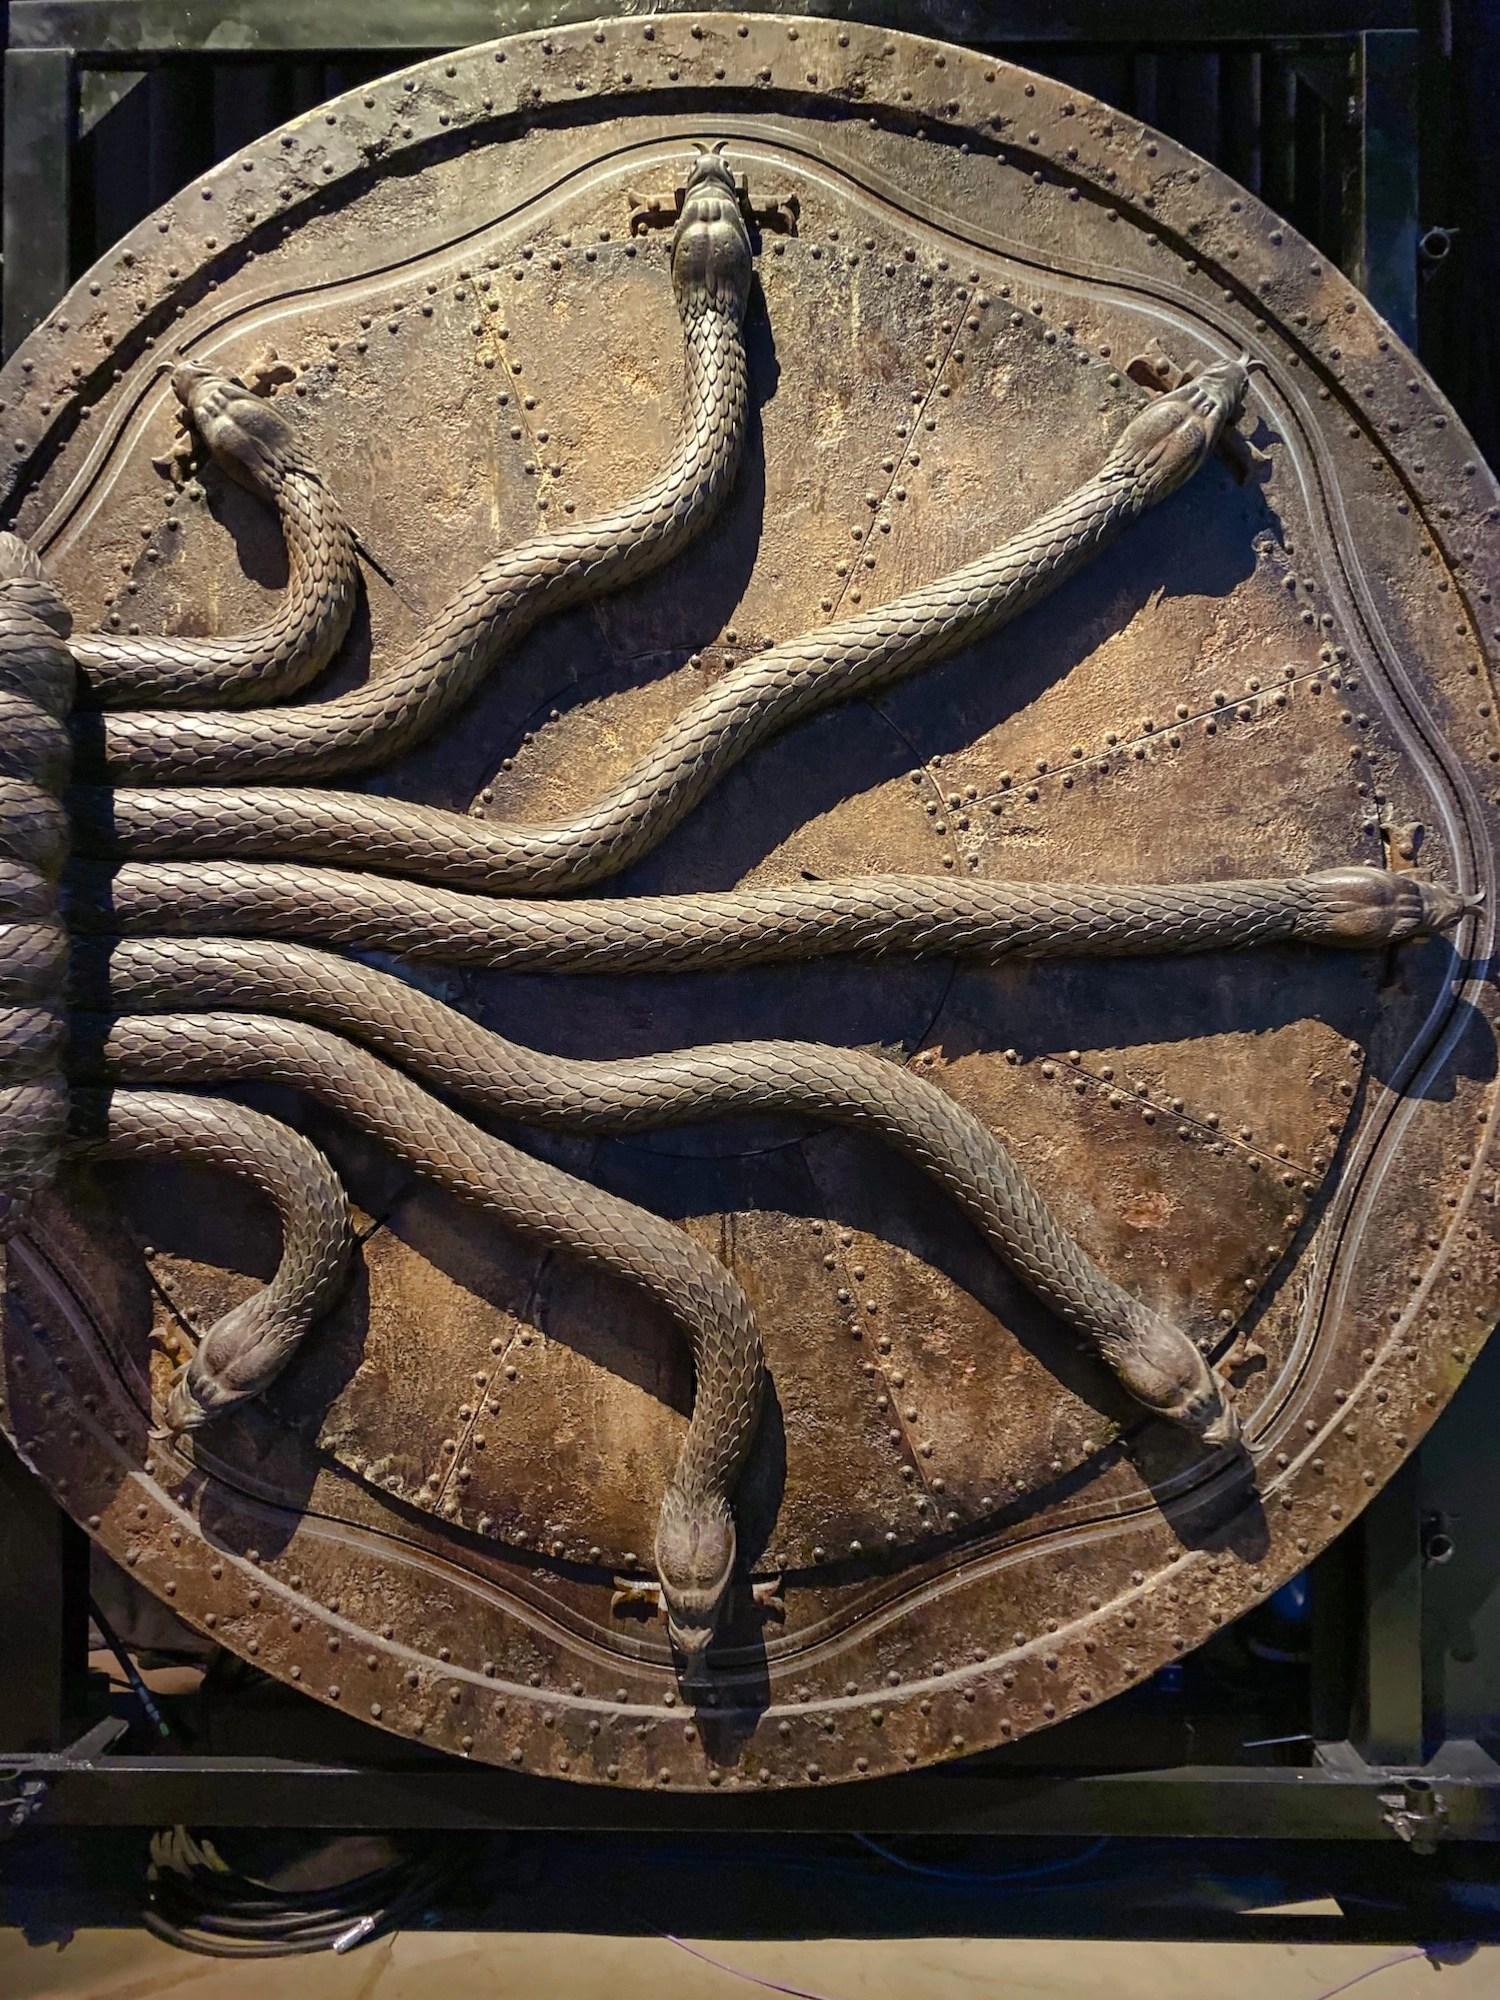 Harry Potter Studio Tour - Chamber of Secrets